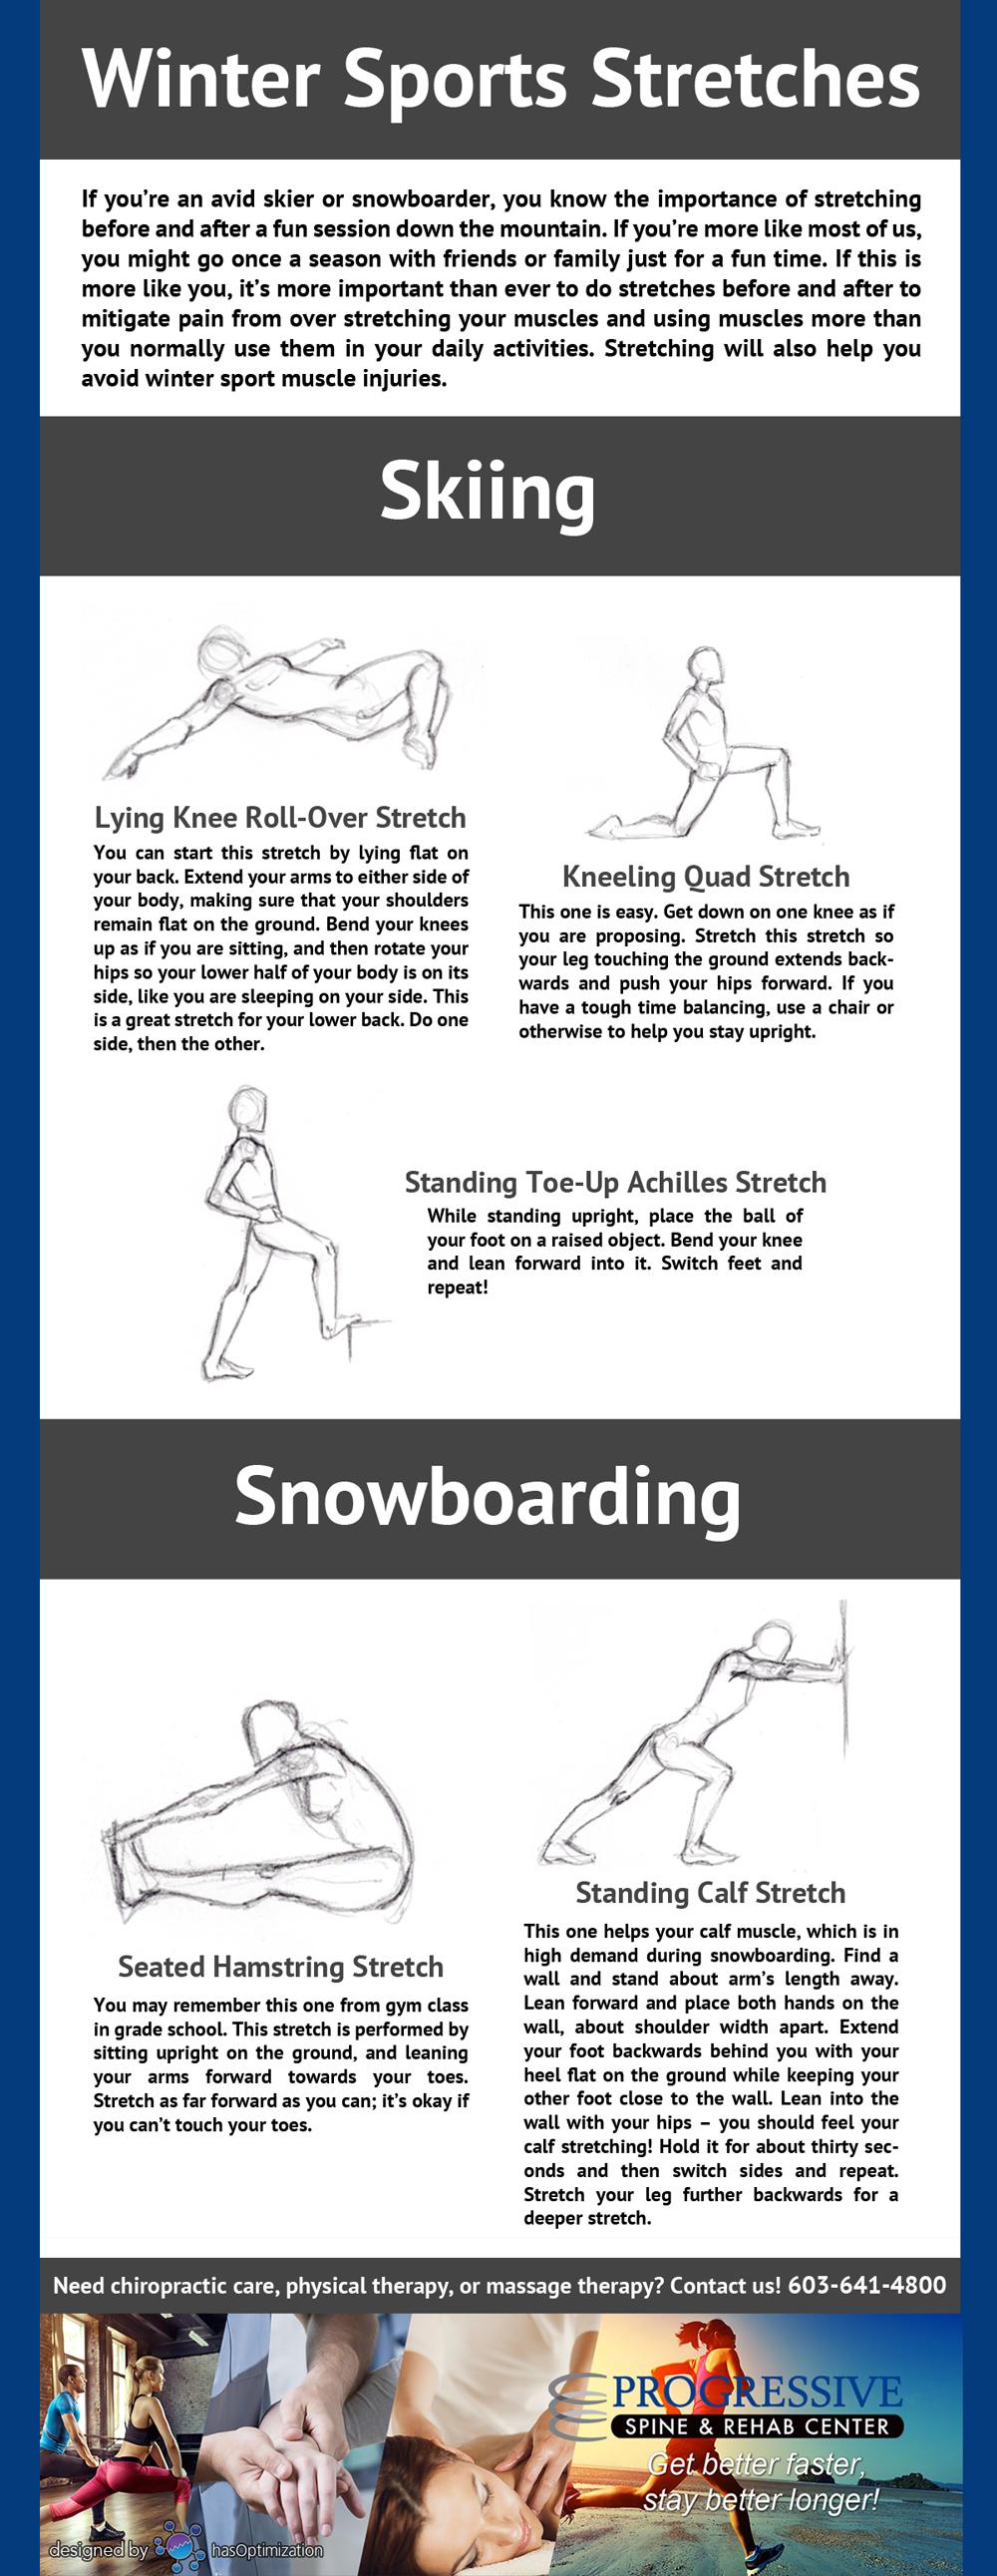 Progressive Spine Winter Sports Stretches